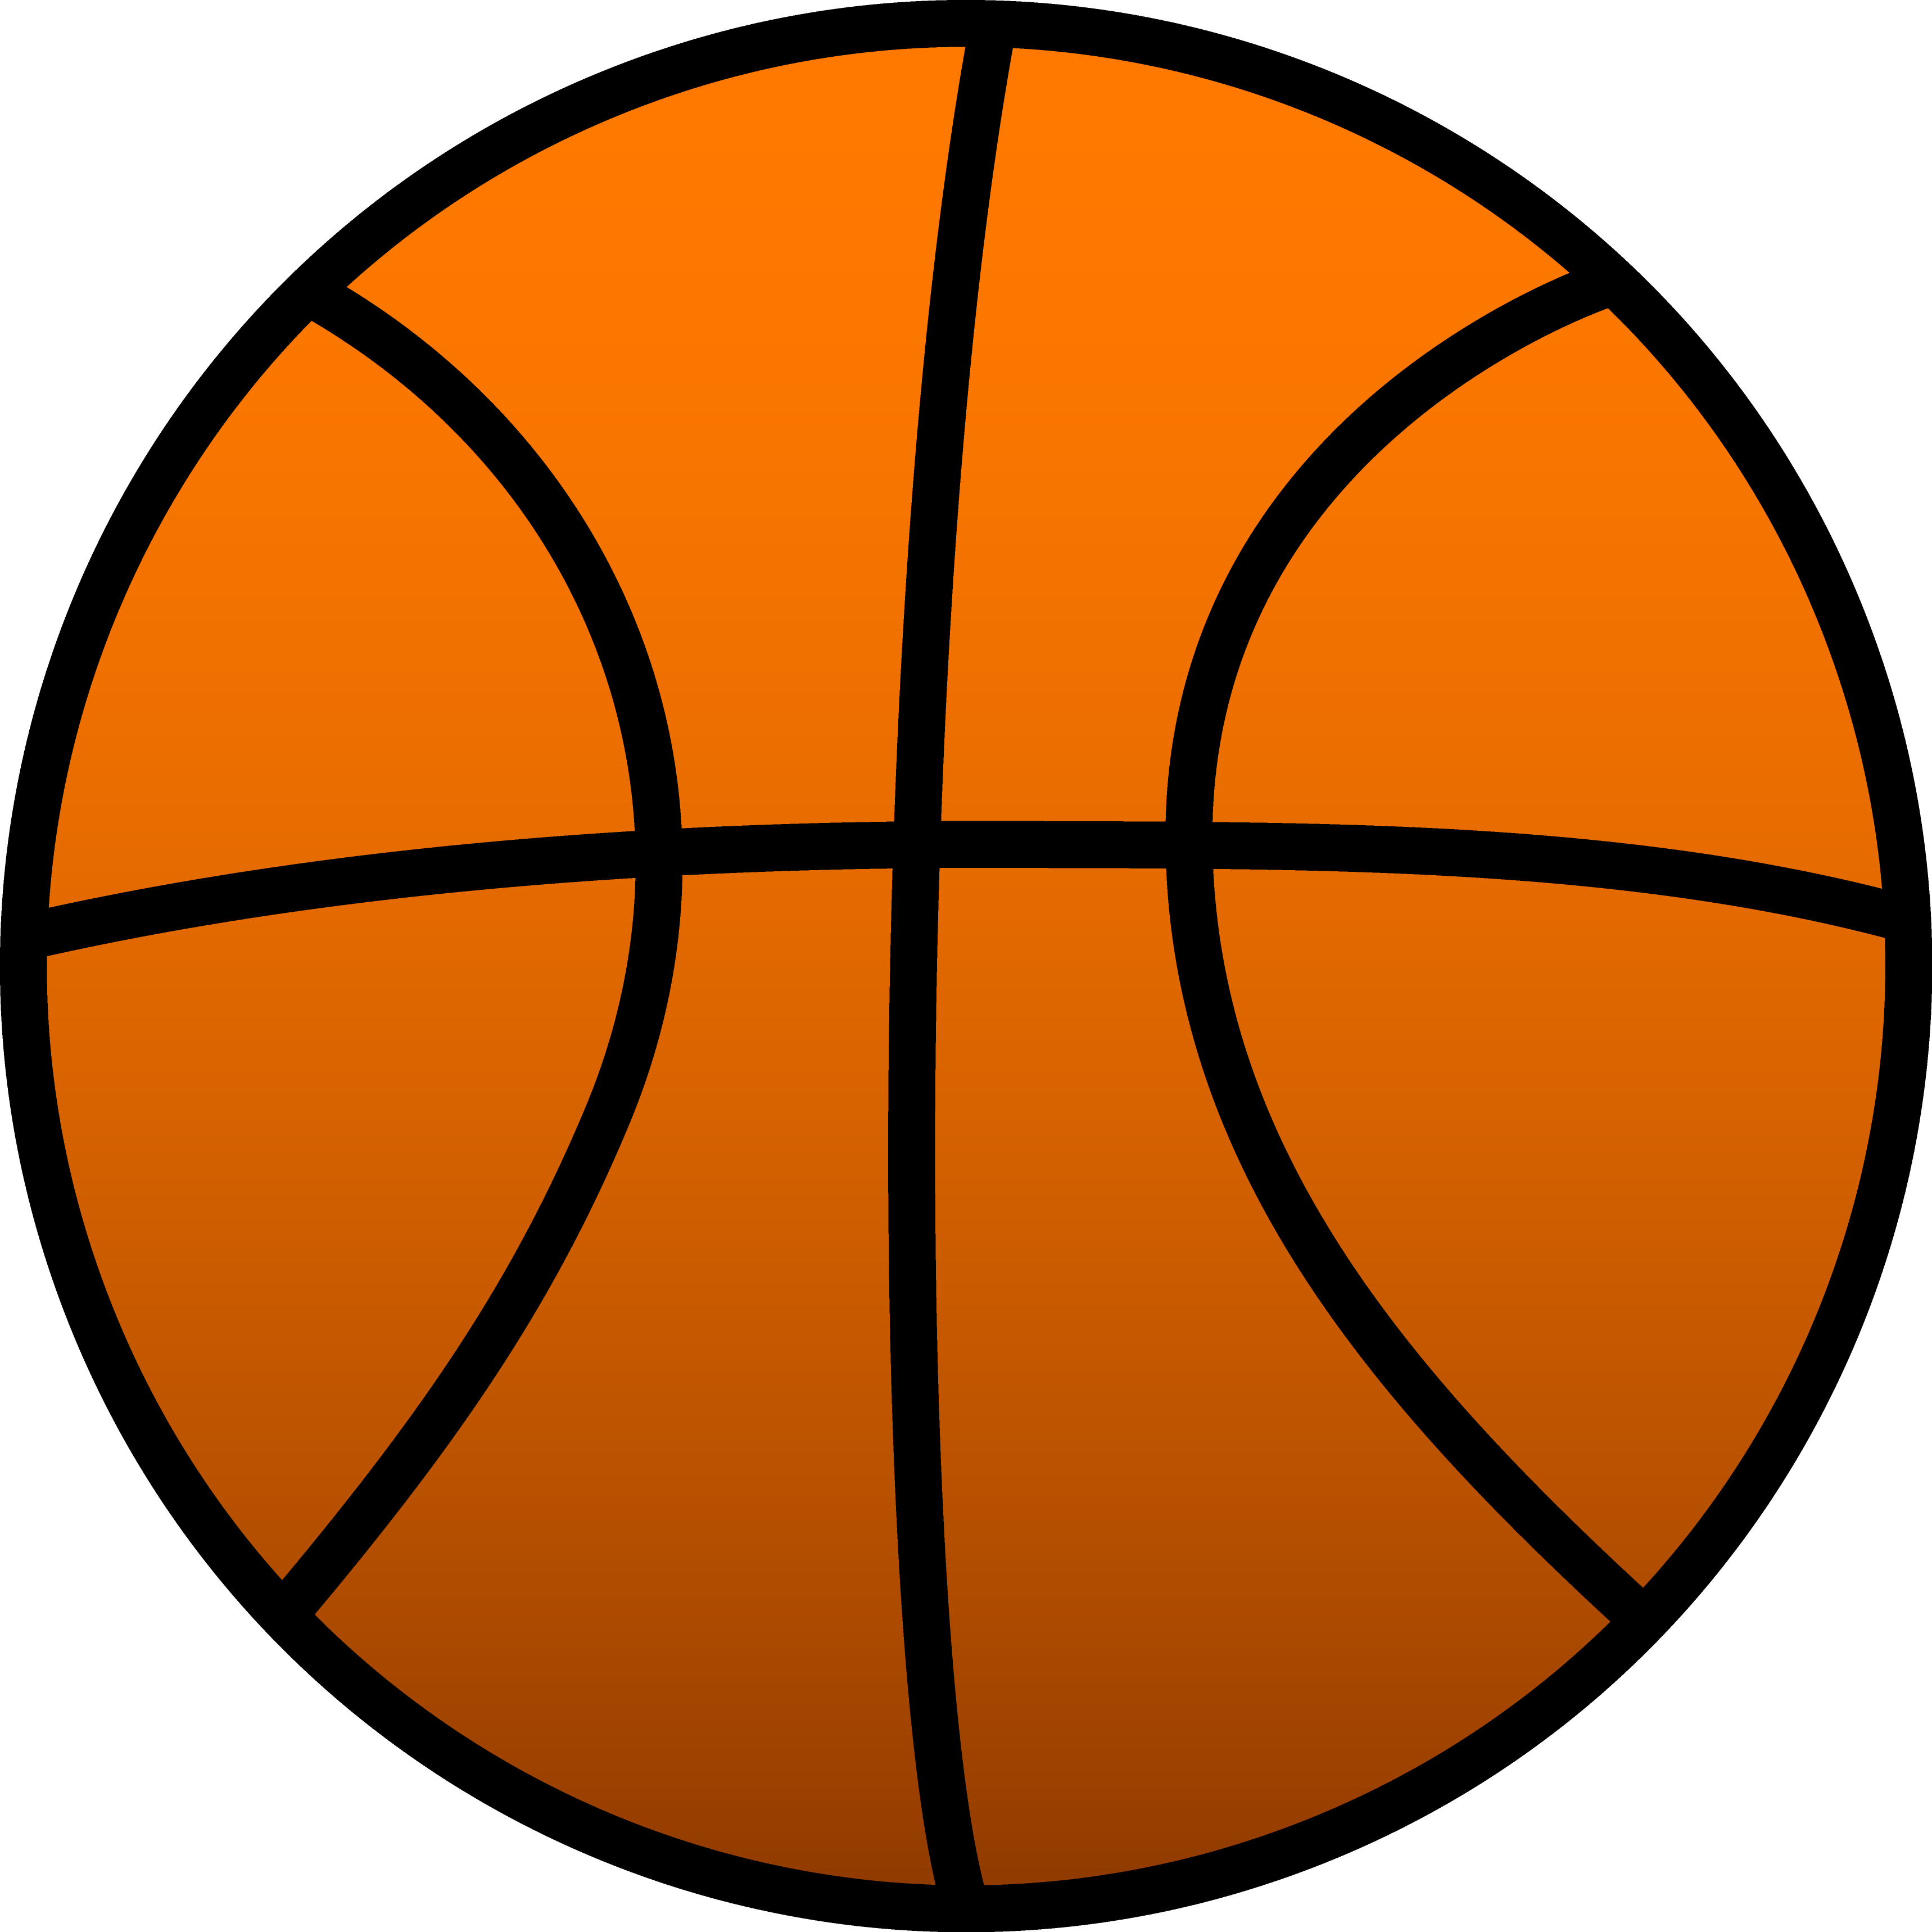 basketball scoreboard clipart